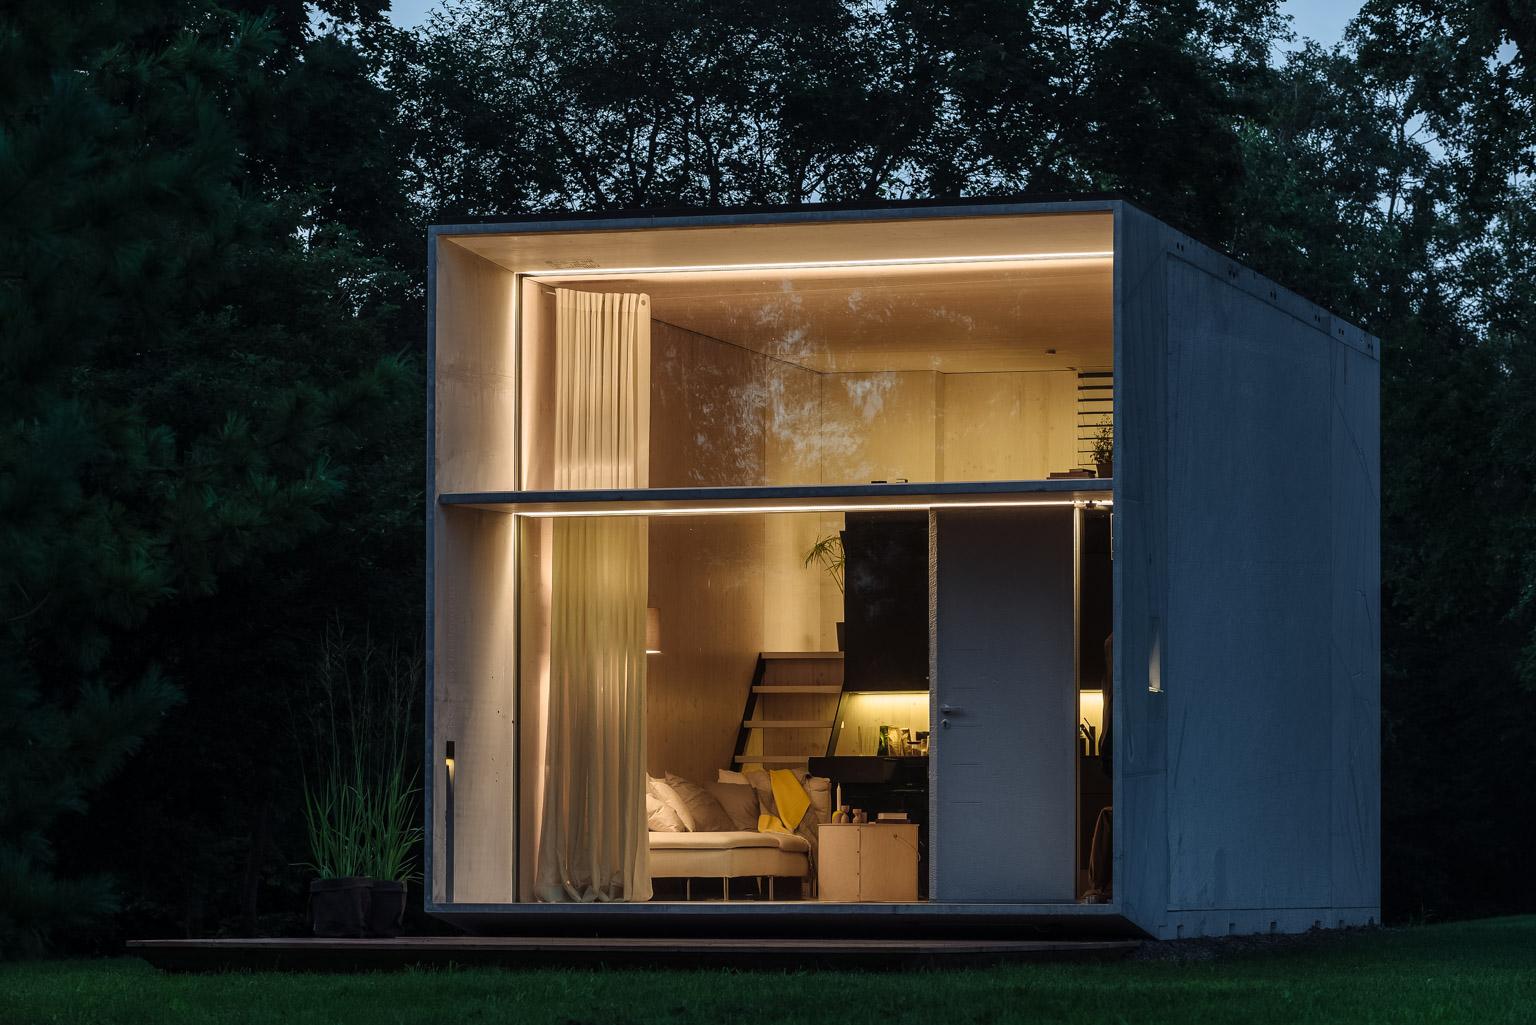 Solar-powered prefab tiny house will do it all for $125K